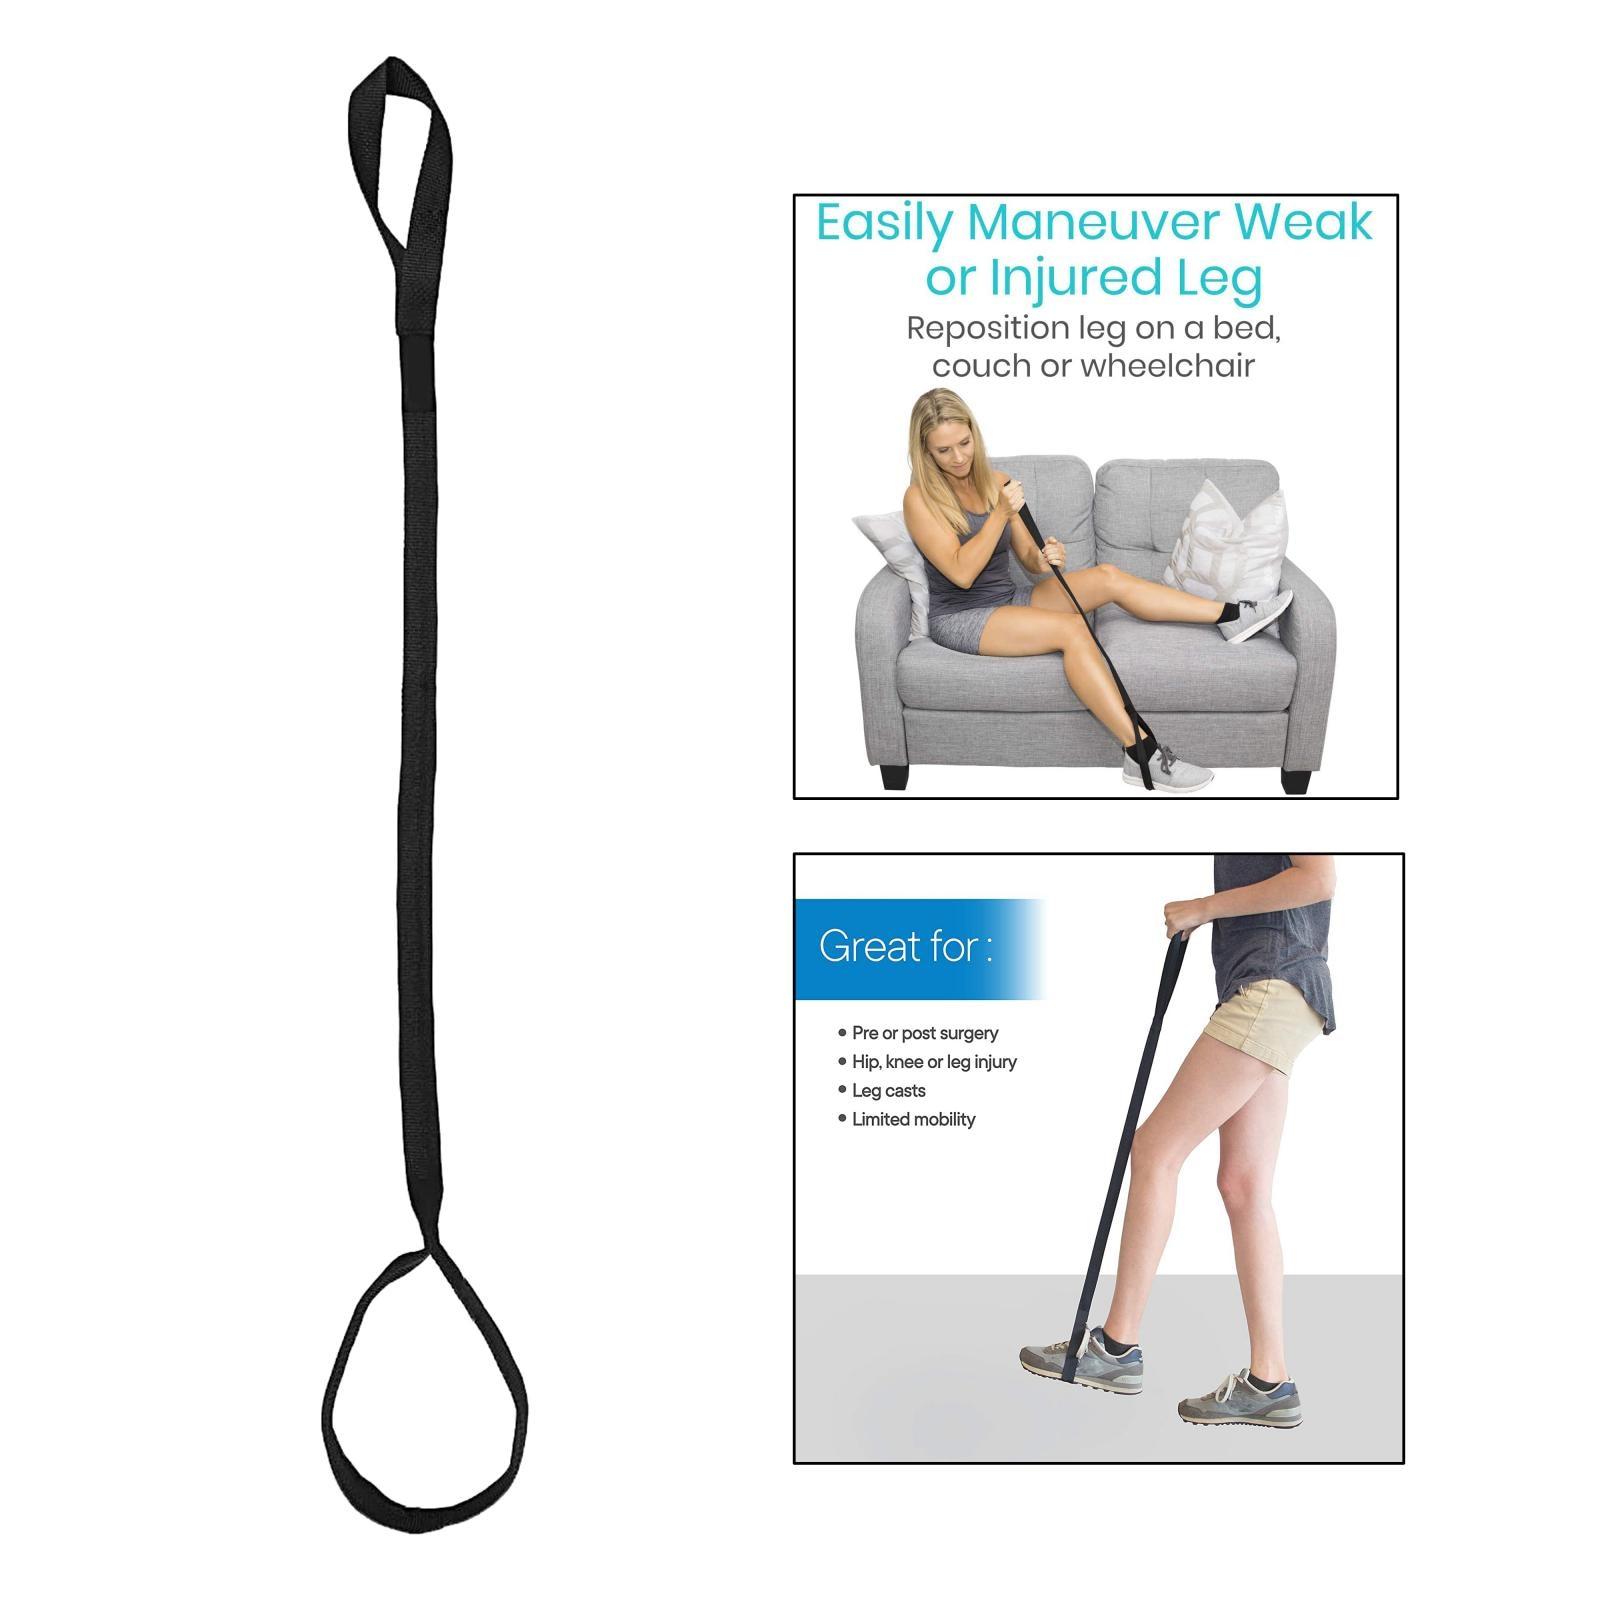 44' Leg Lifter Strap Rigid Foot Lifter&Hand Grip for Adult Elderly Handicap Mobility Aids Equipment Foot Raiser Straps